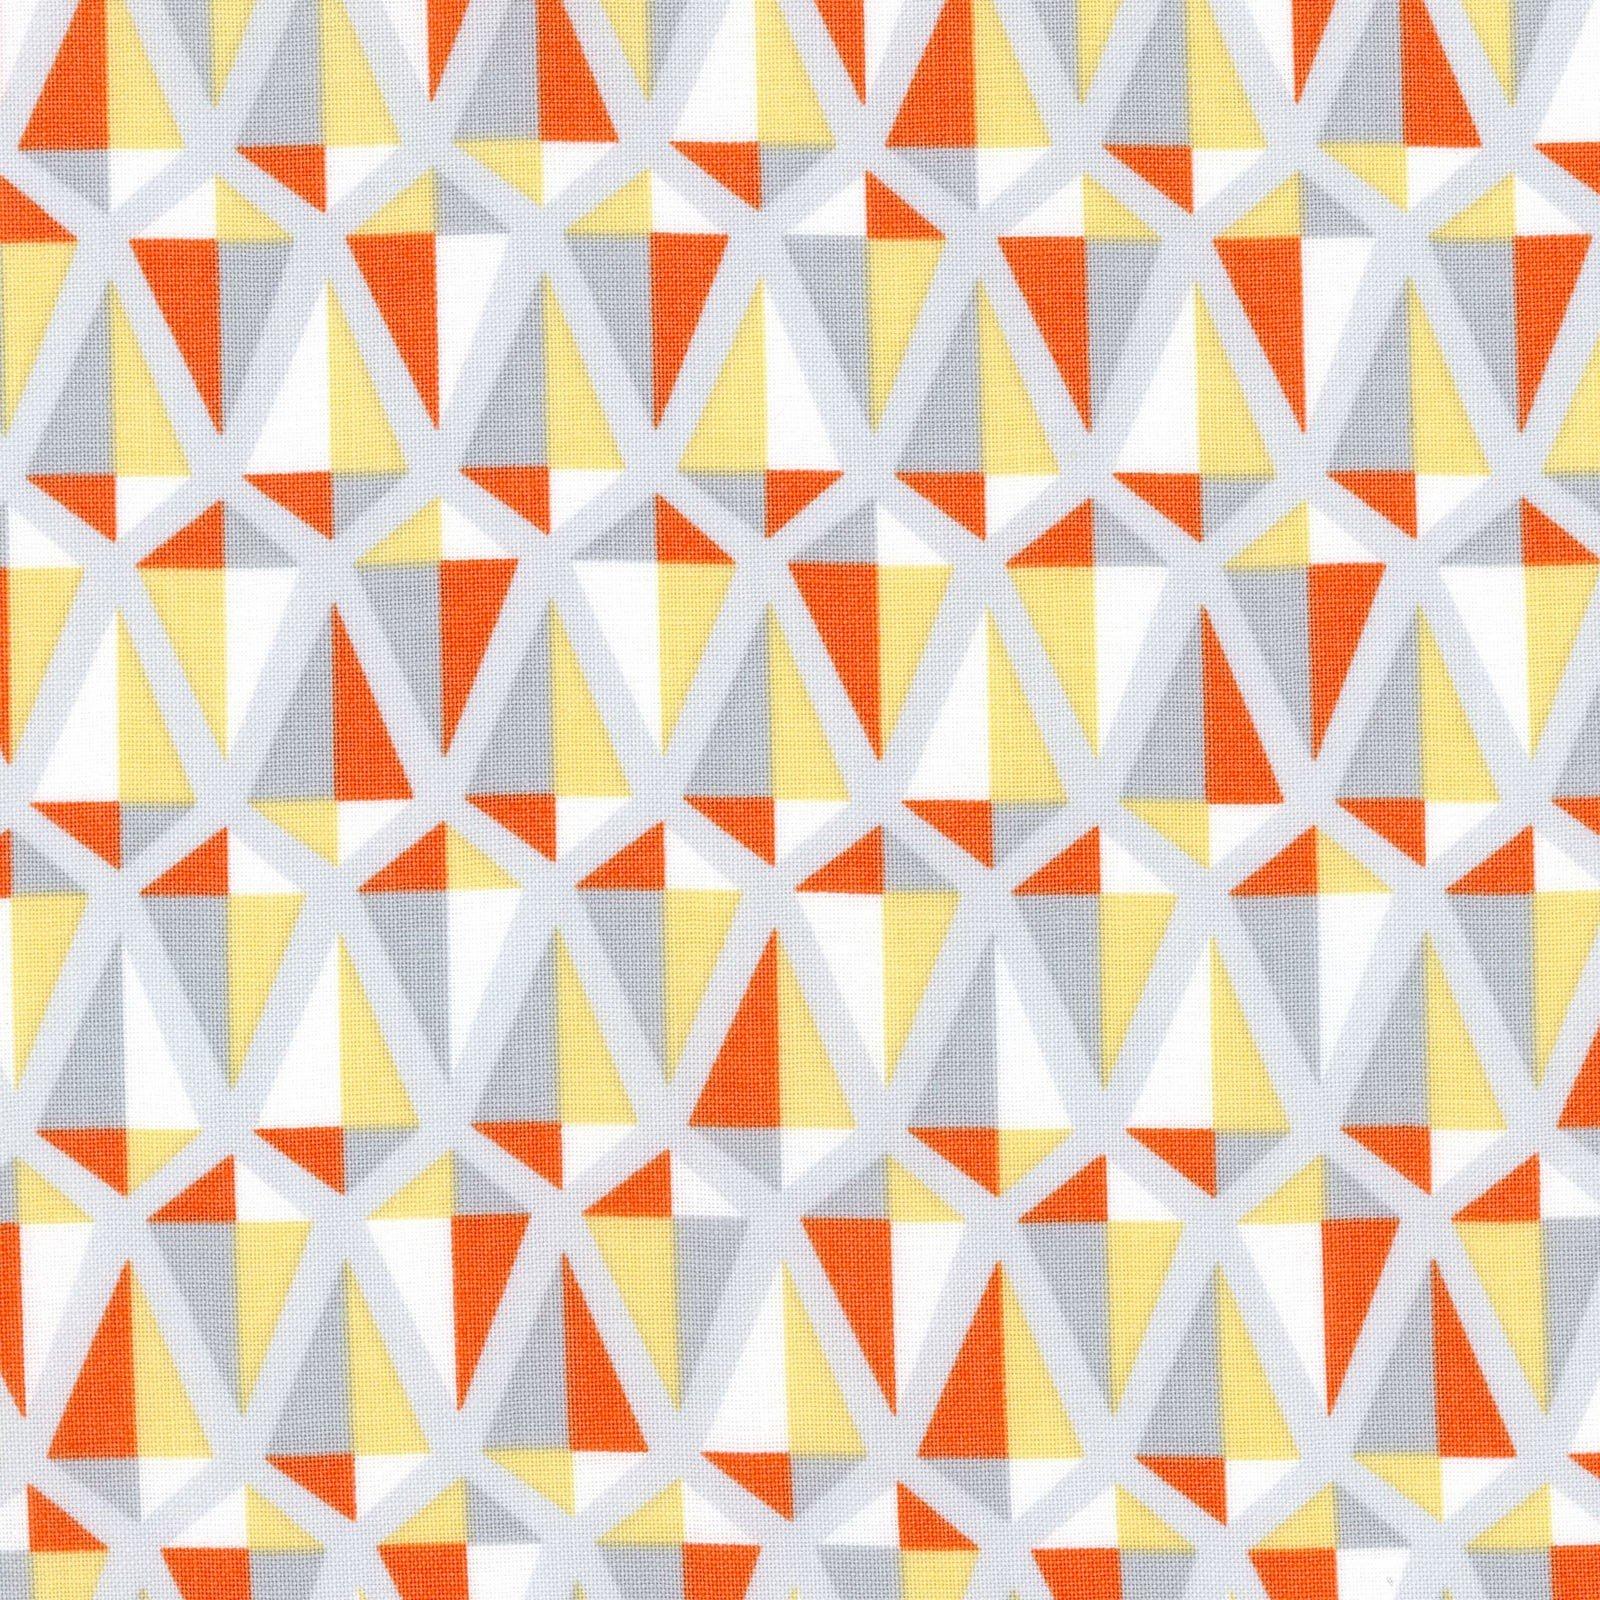 Cycles of Life Kite Mosaic Orange